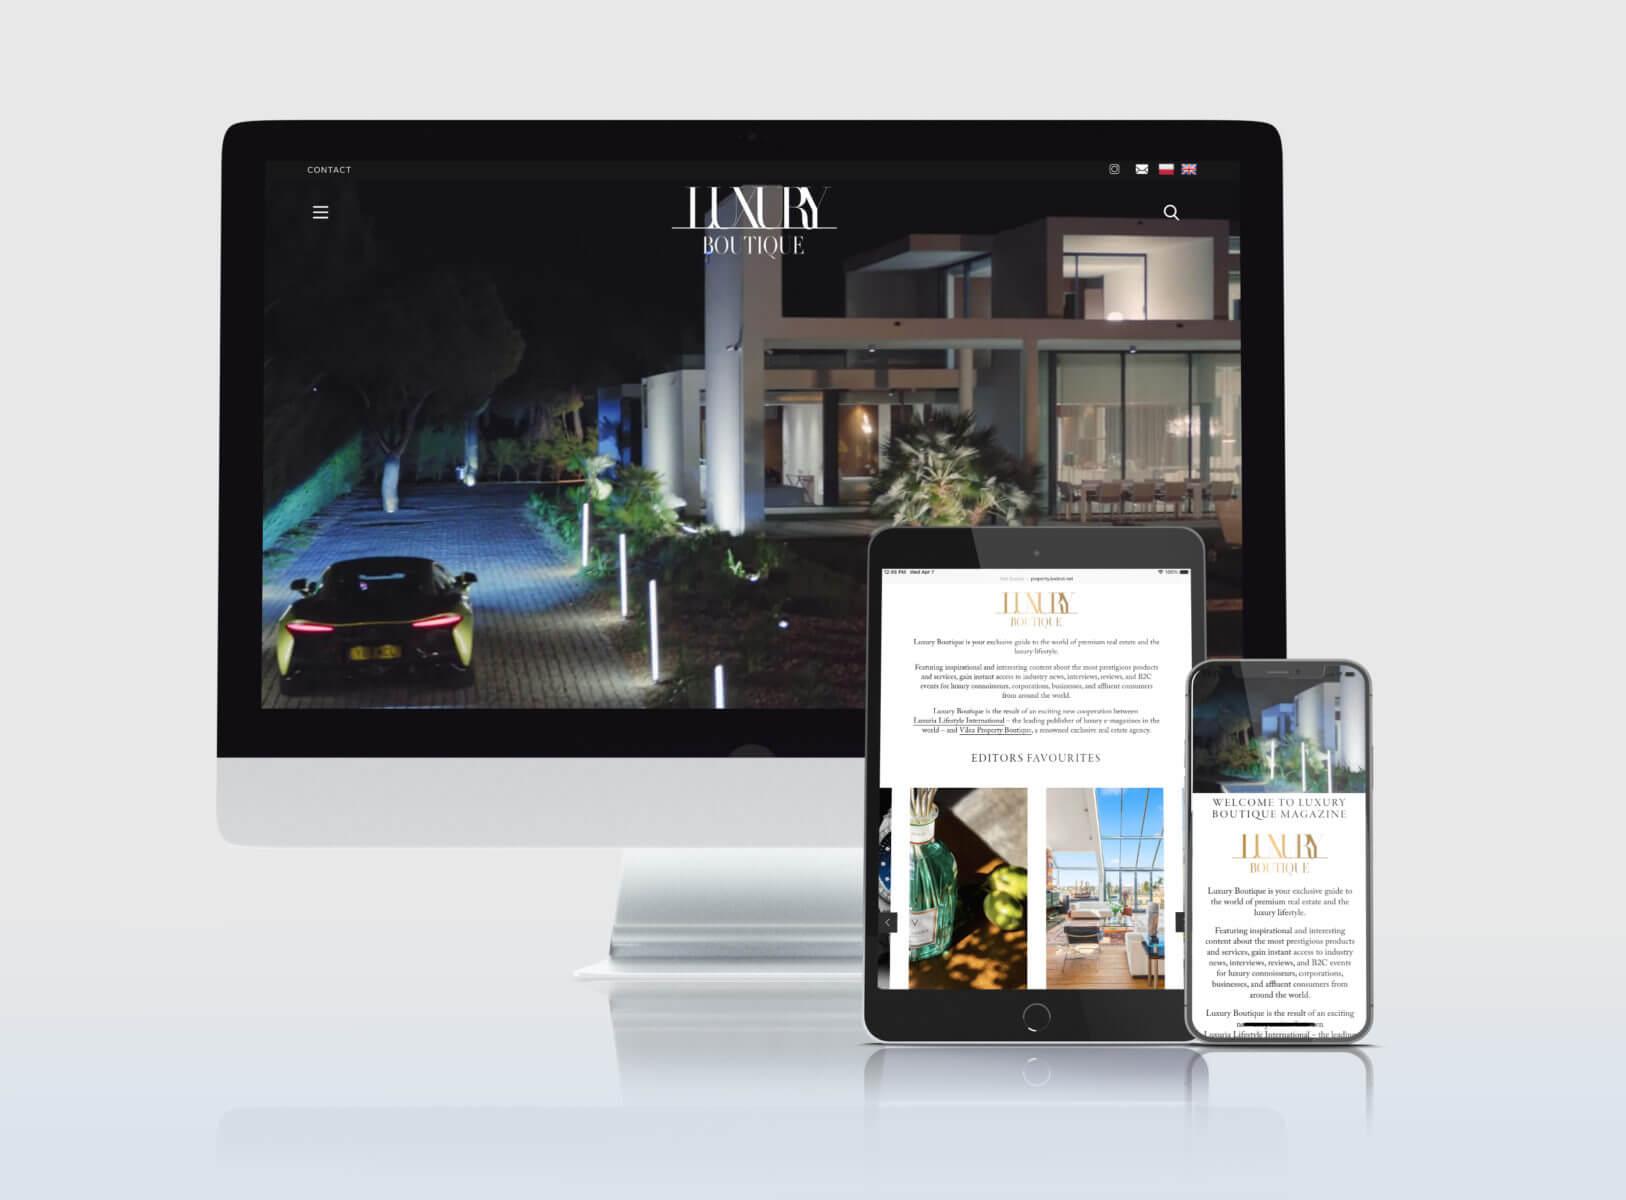 LUXURIA DESIGN CREATES THE NEW LUXURY BOUTIQUE WEBSITE AND E-MAGAZINE FOR LEADING POLISH BRAND